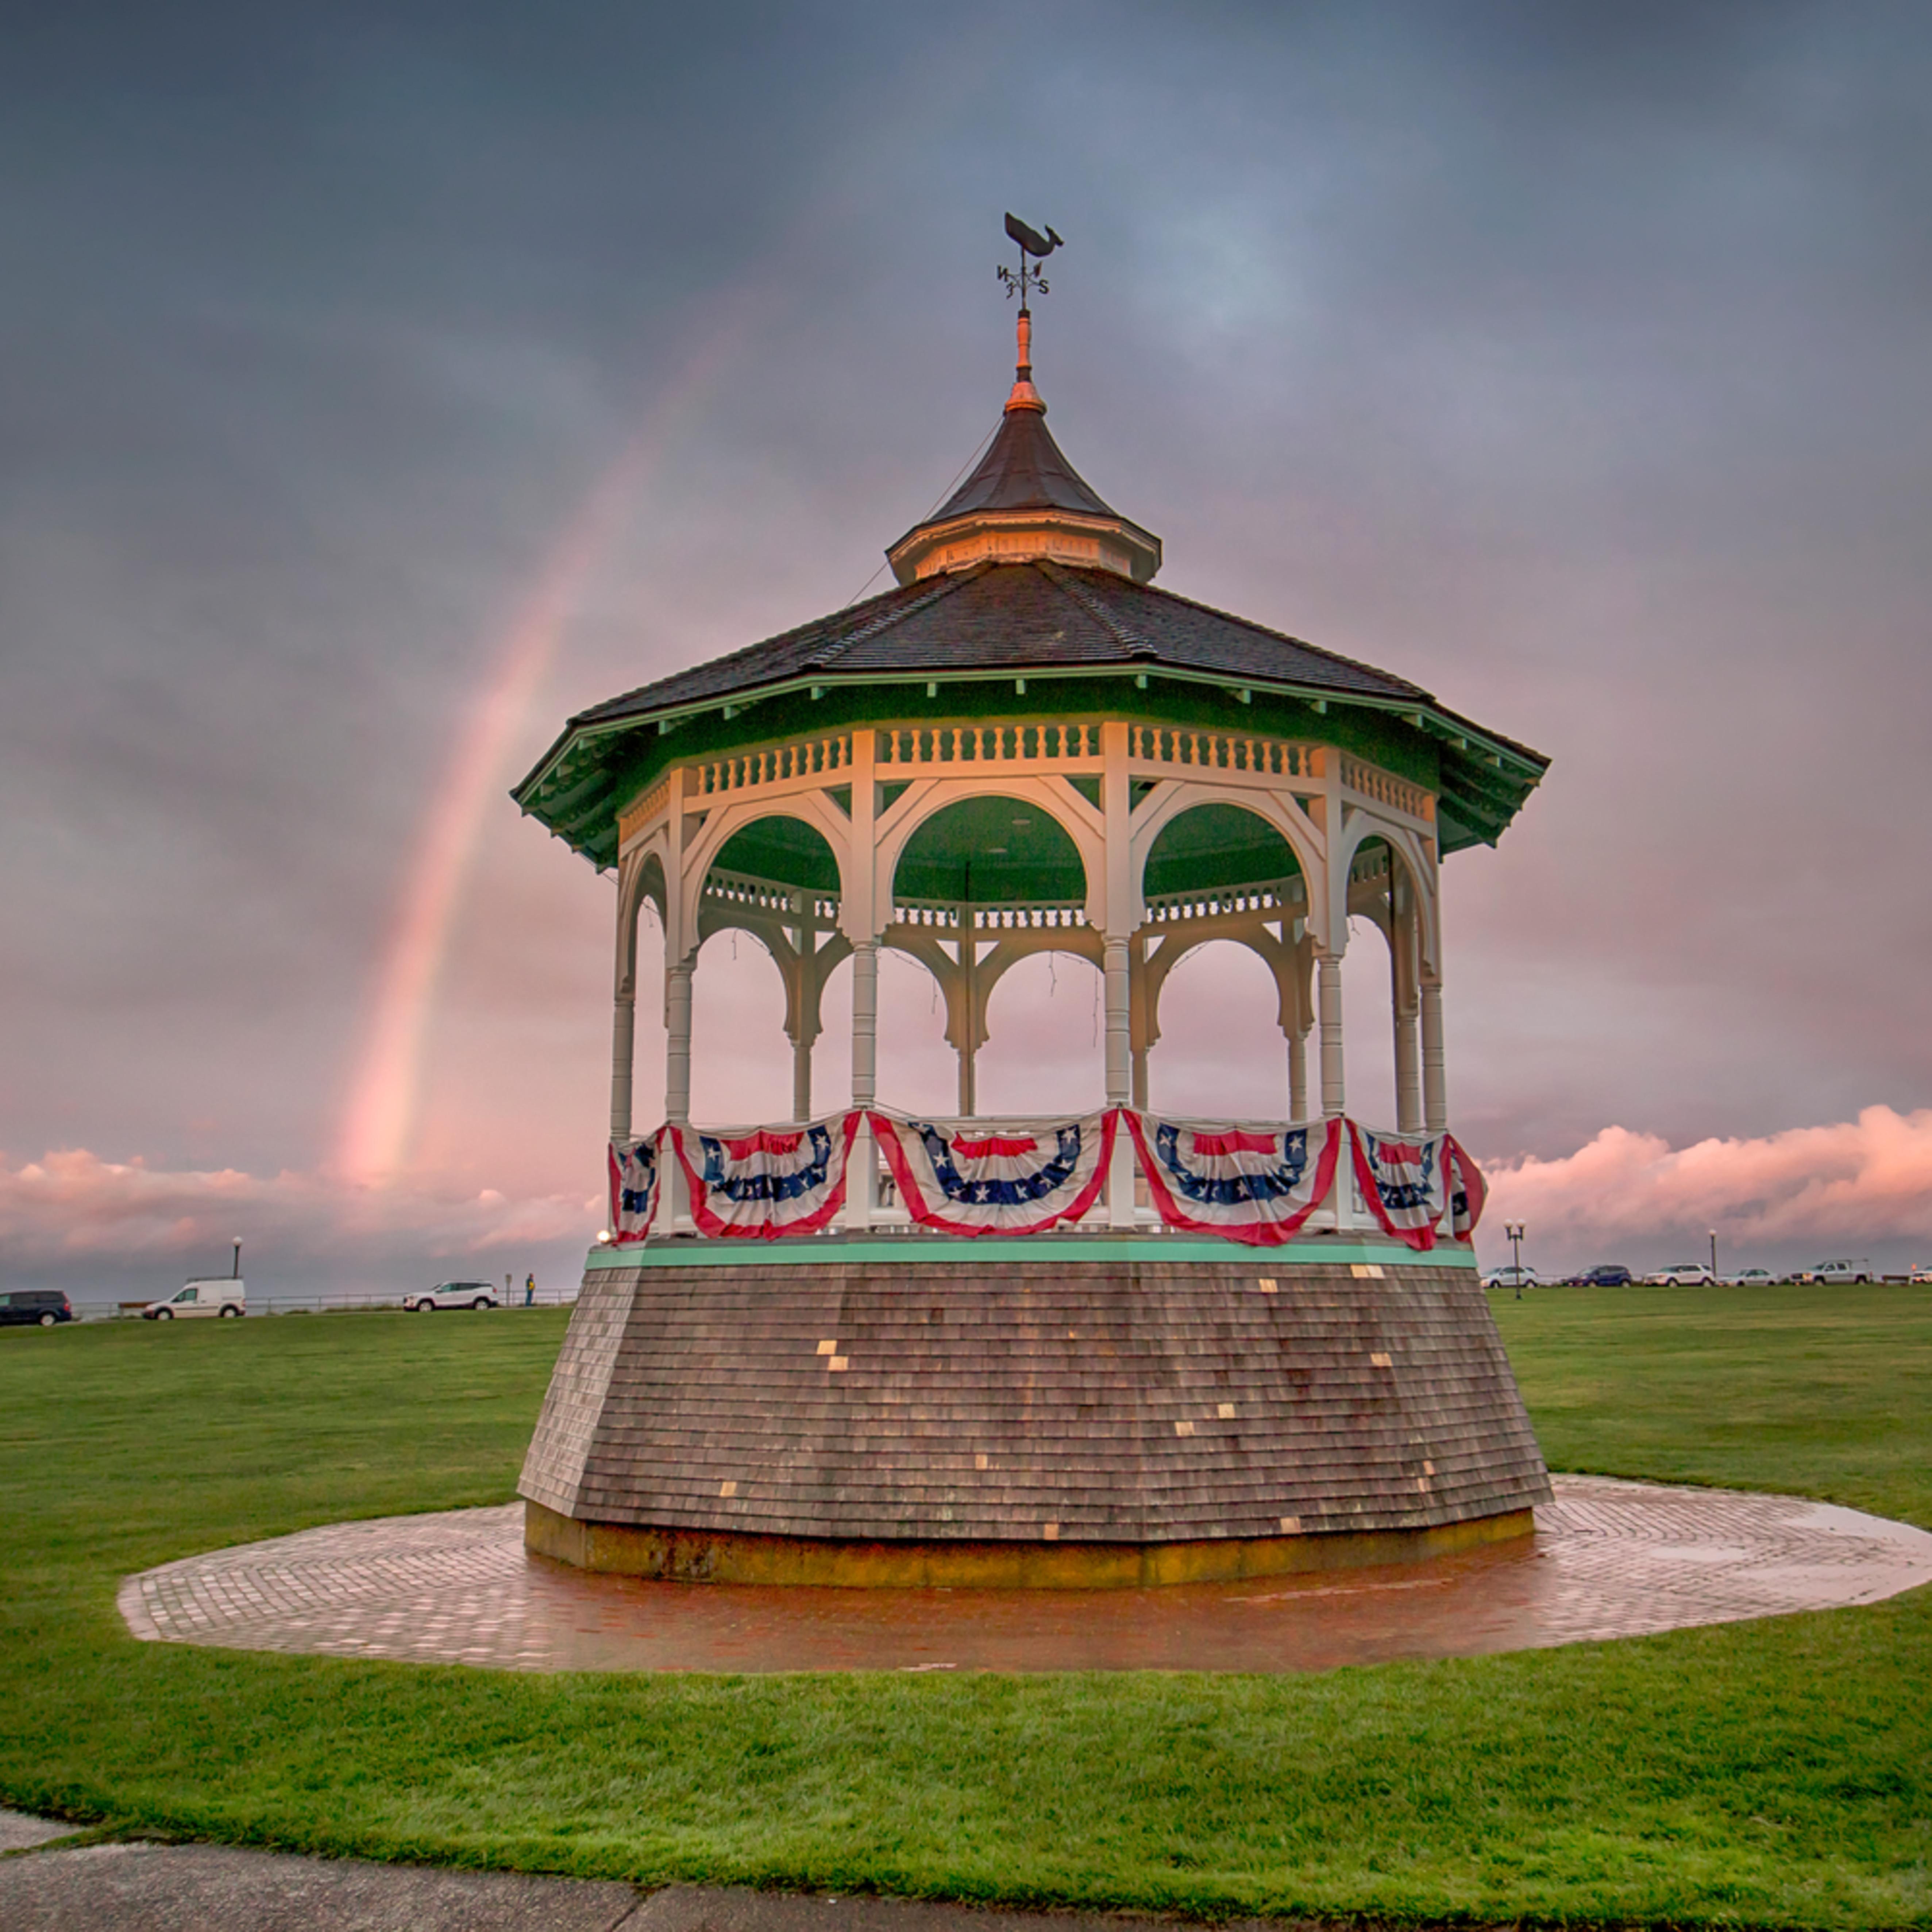 Oak bluffs bandstand rainbow kuprwb